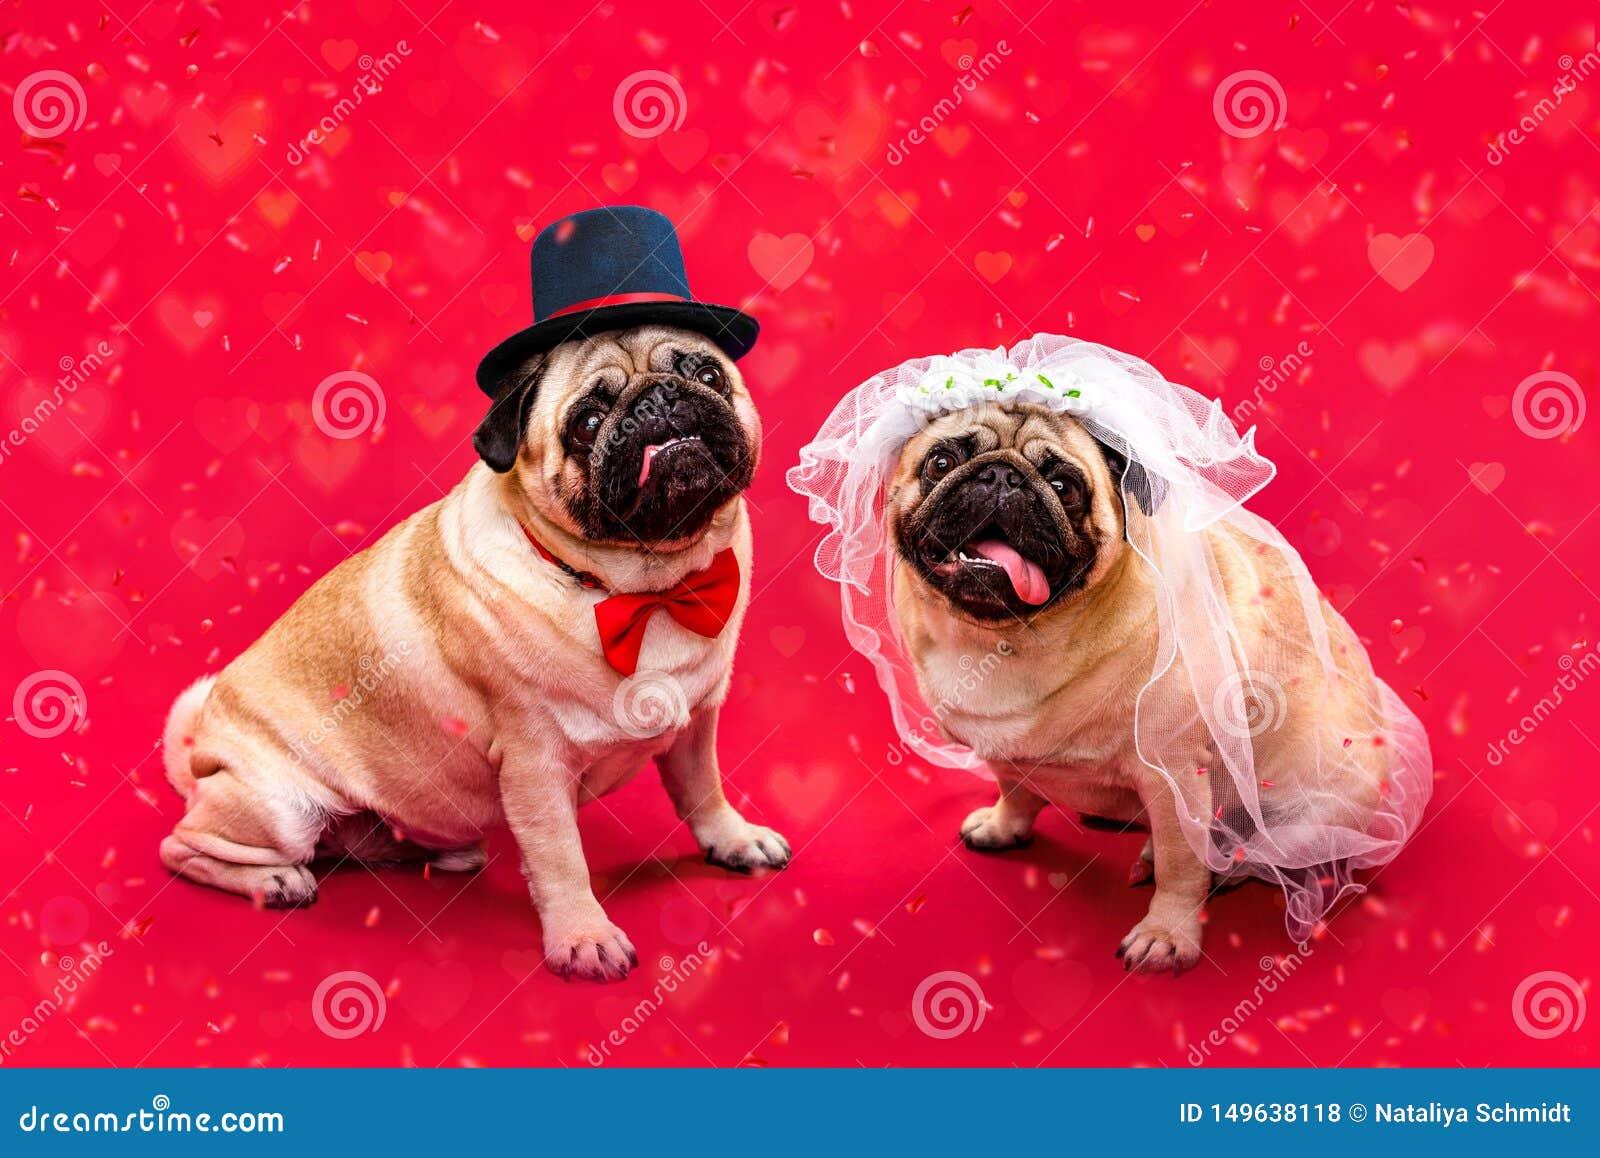 Dog bride and groom. Two pugs. Dog wedding. Bride and groom